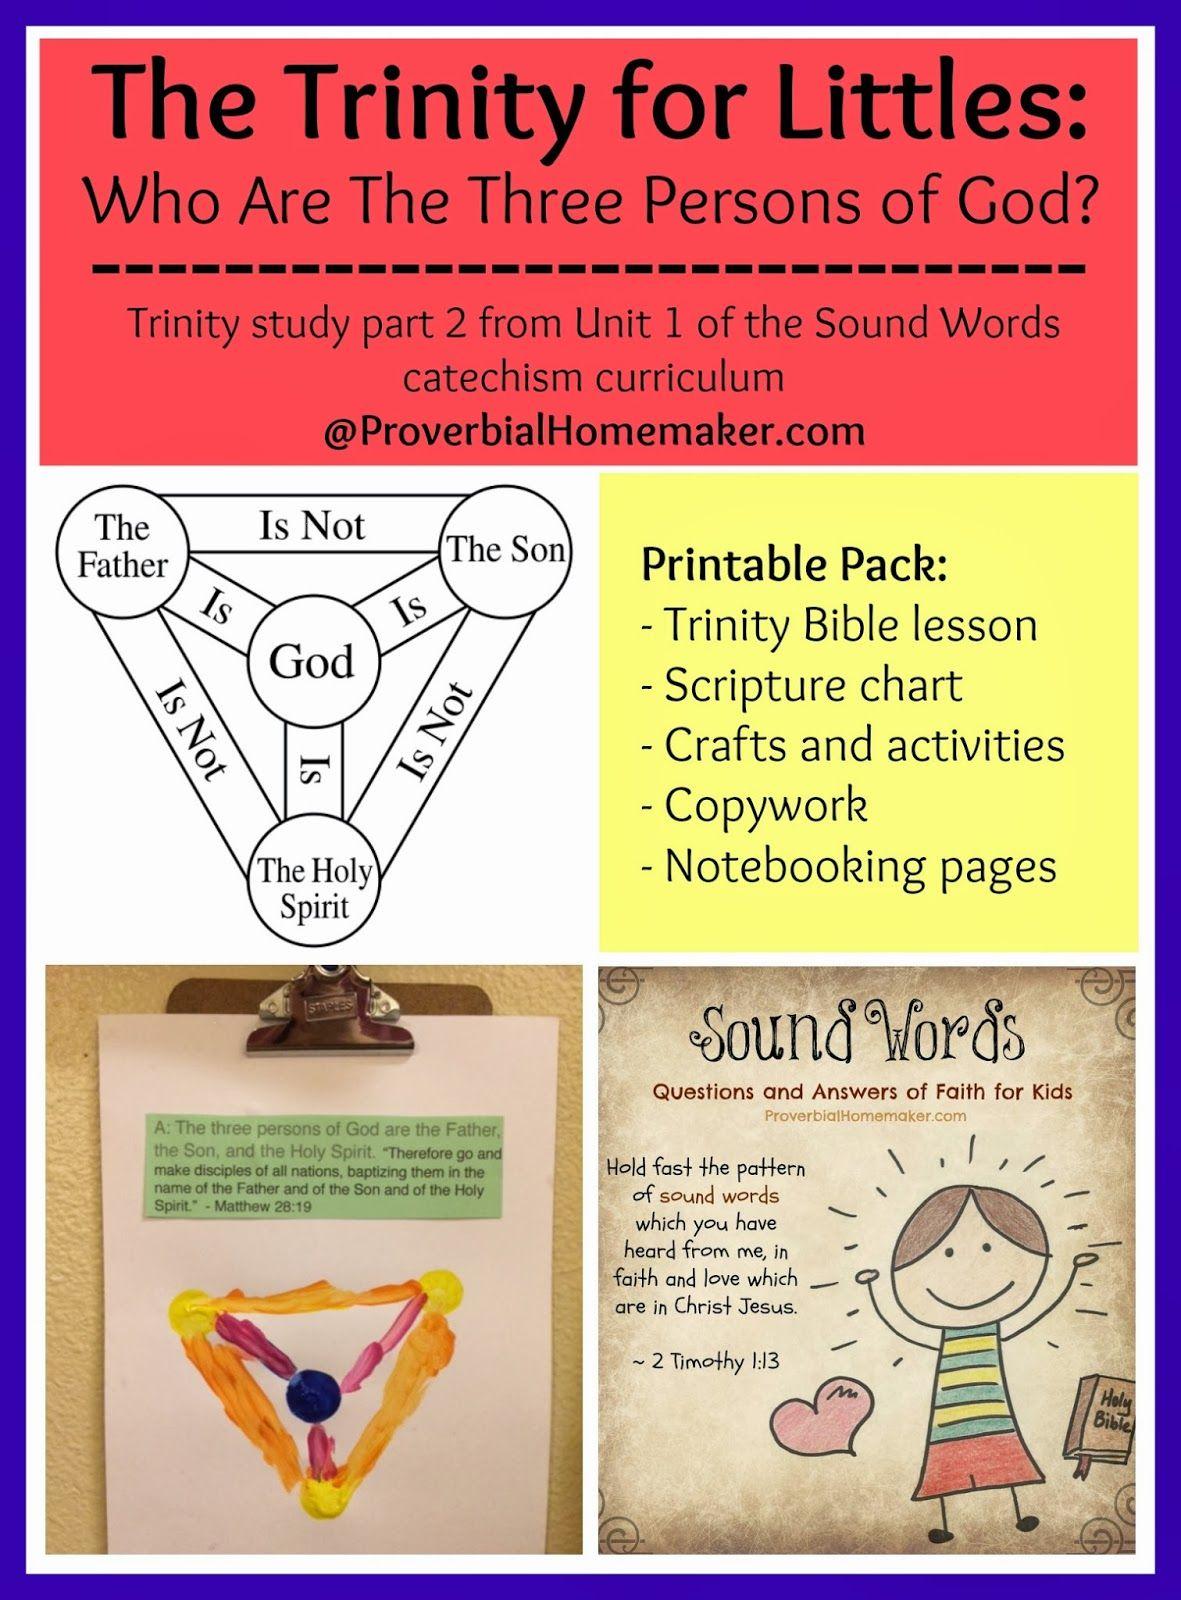 Teach Kids Kindness Printable Pack